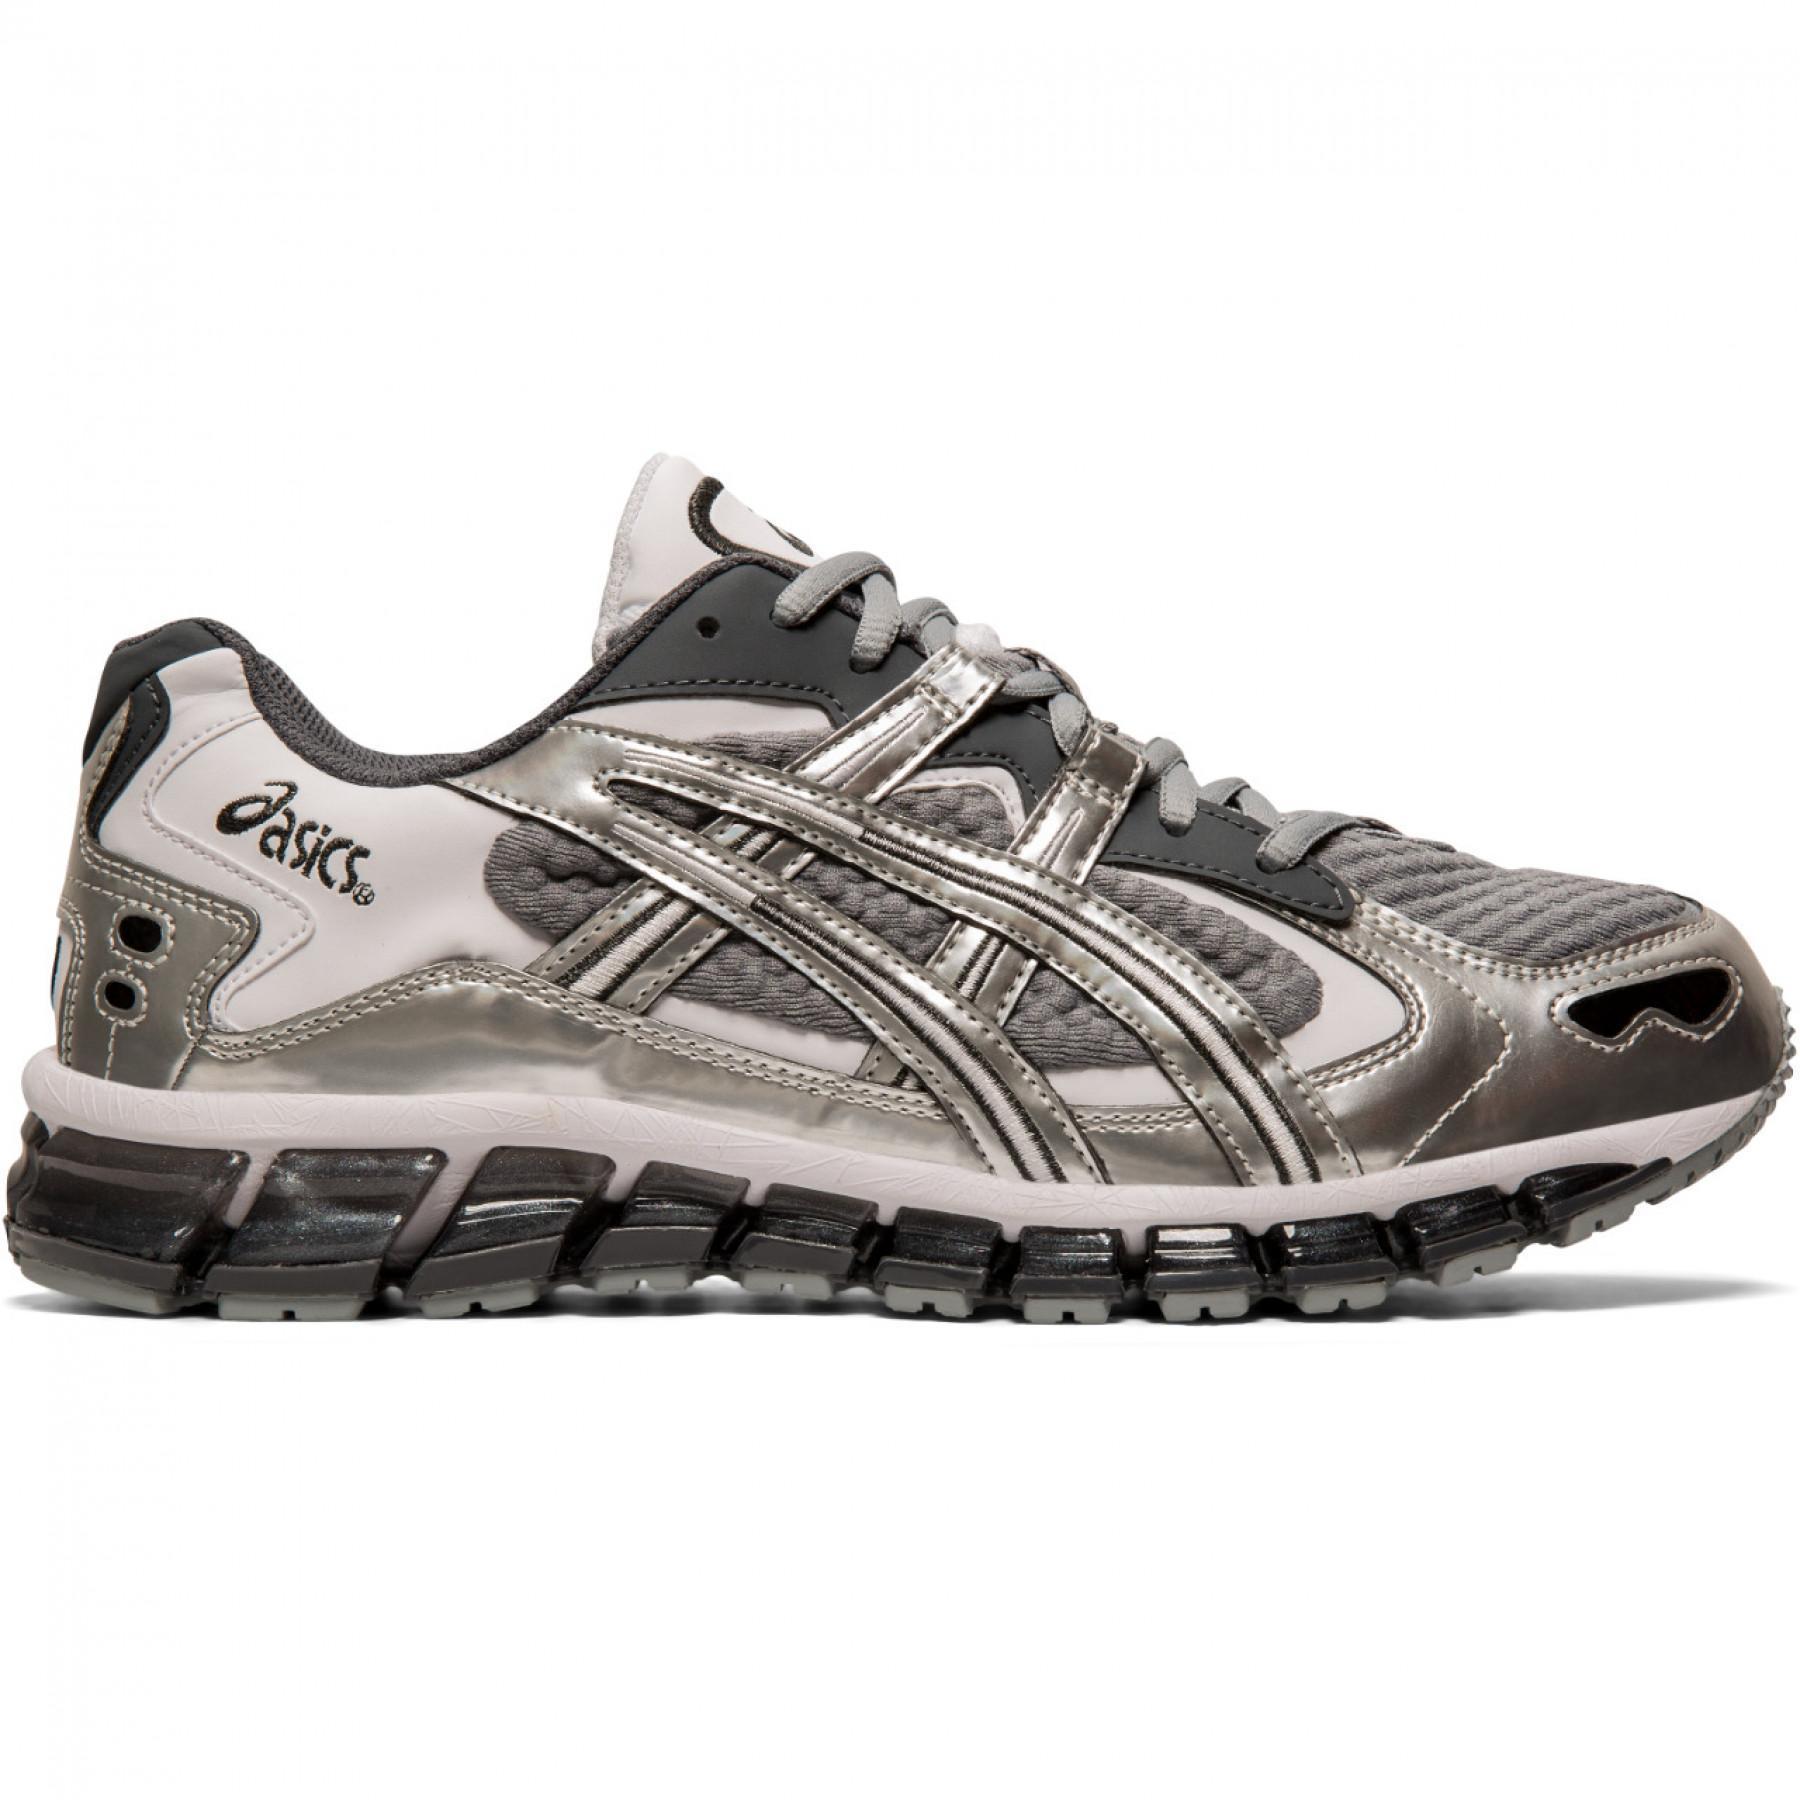 Chaussures Asics Gel-Kayano 5 360